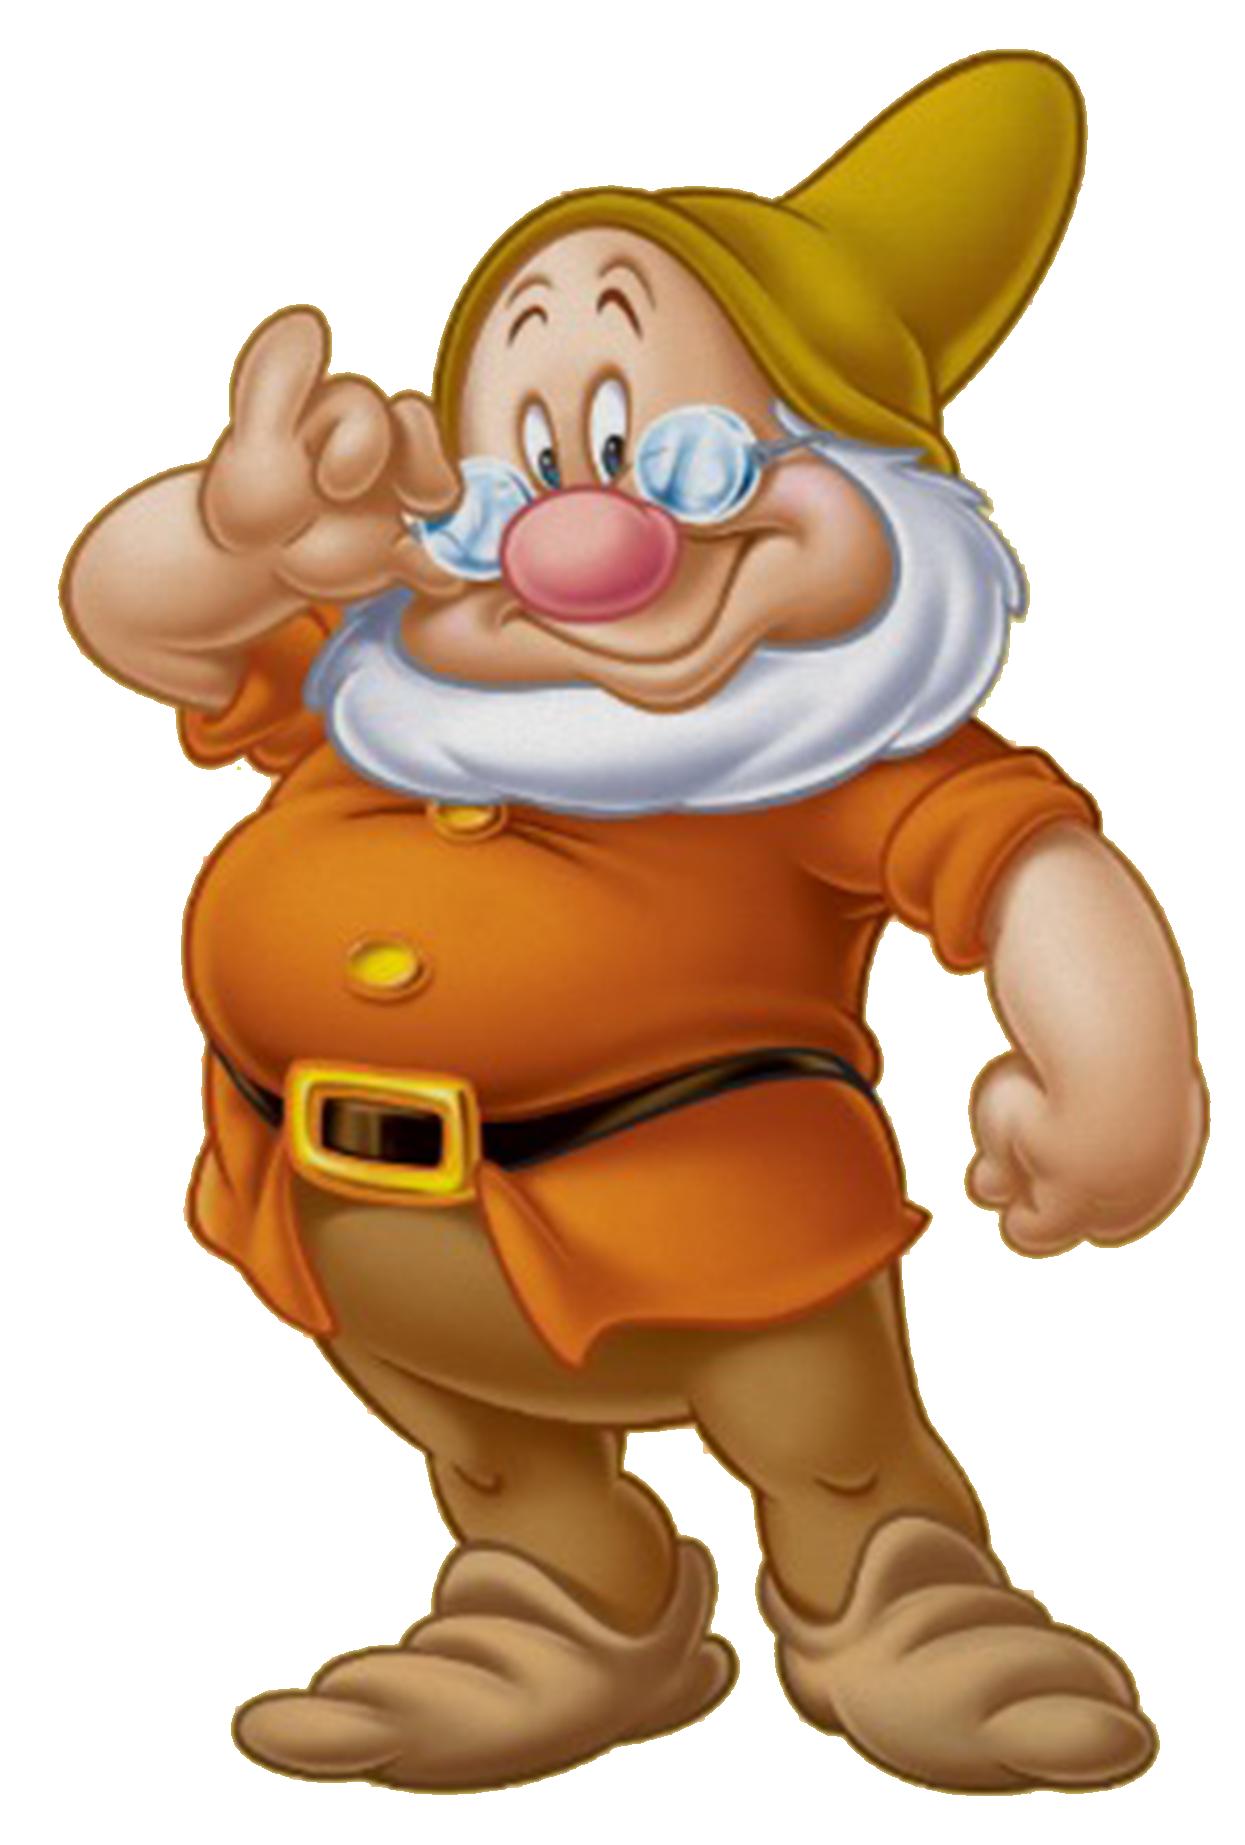 Disney Seven Dwarfs Clip Art